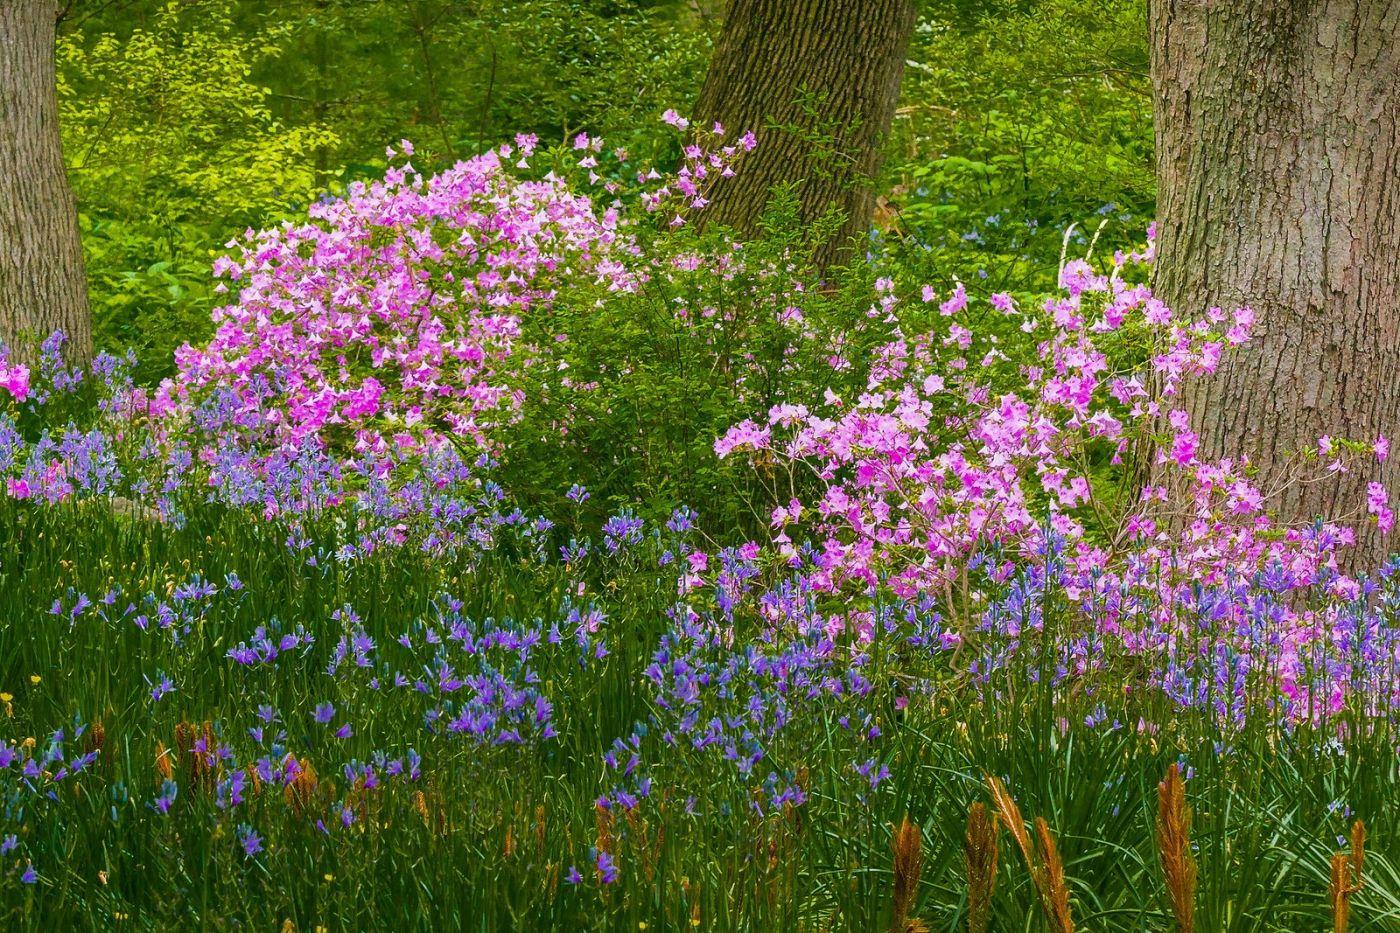 Chanticleer花园,有梦想的季节_图1-10